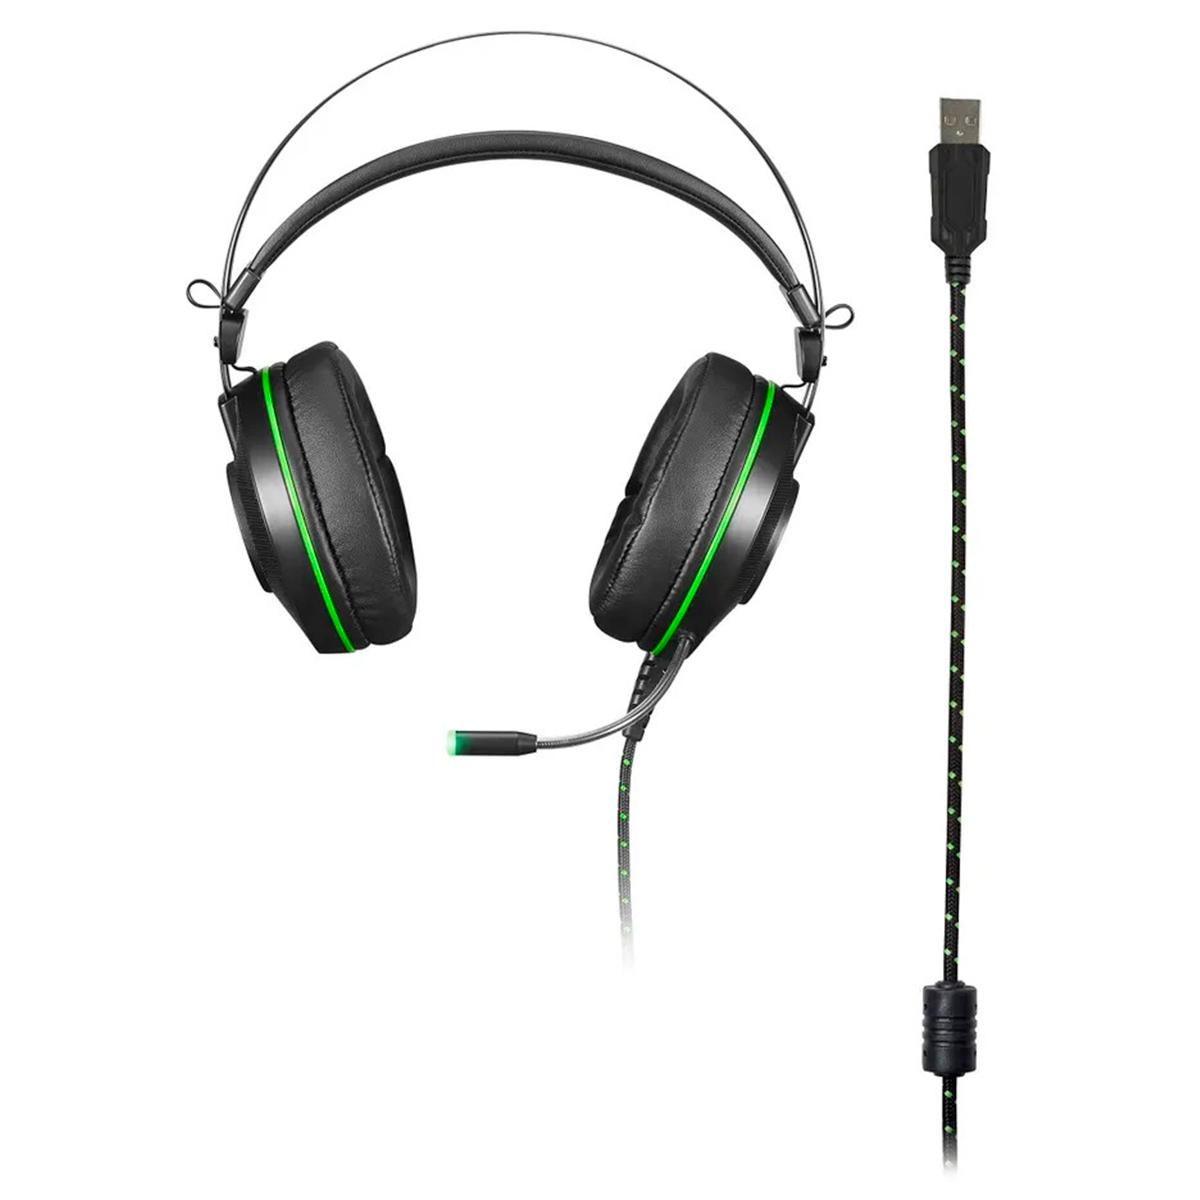 Headset Gamer Multilaser Warrior Raiko USB Drivers 50mm Som 3D Digital 7.1 Surround LED Verde  PH259